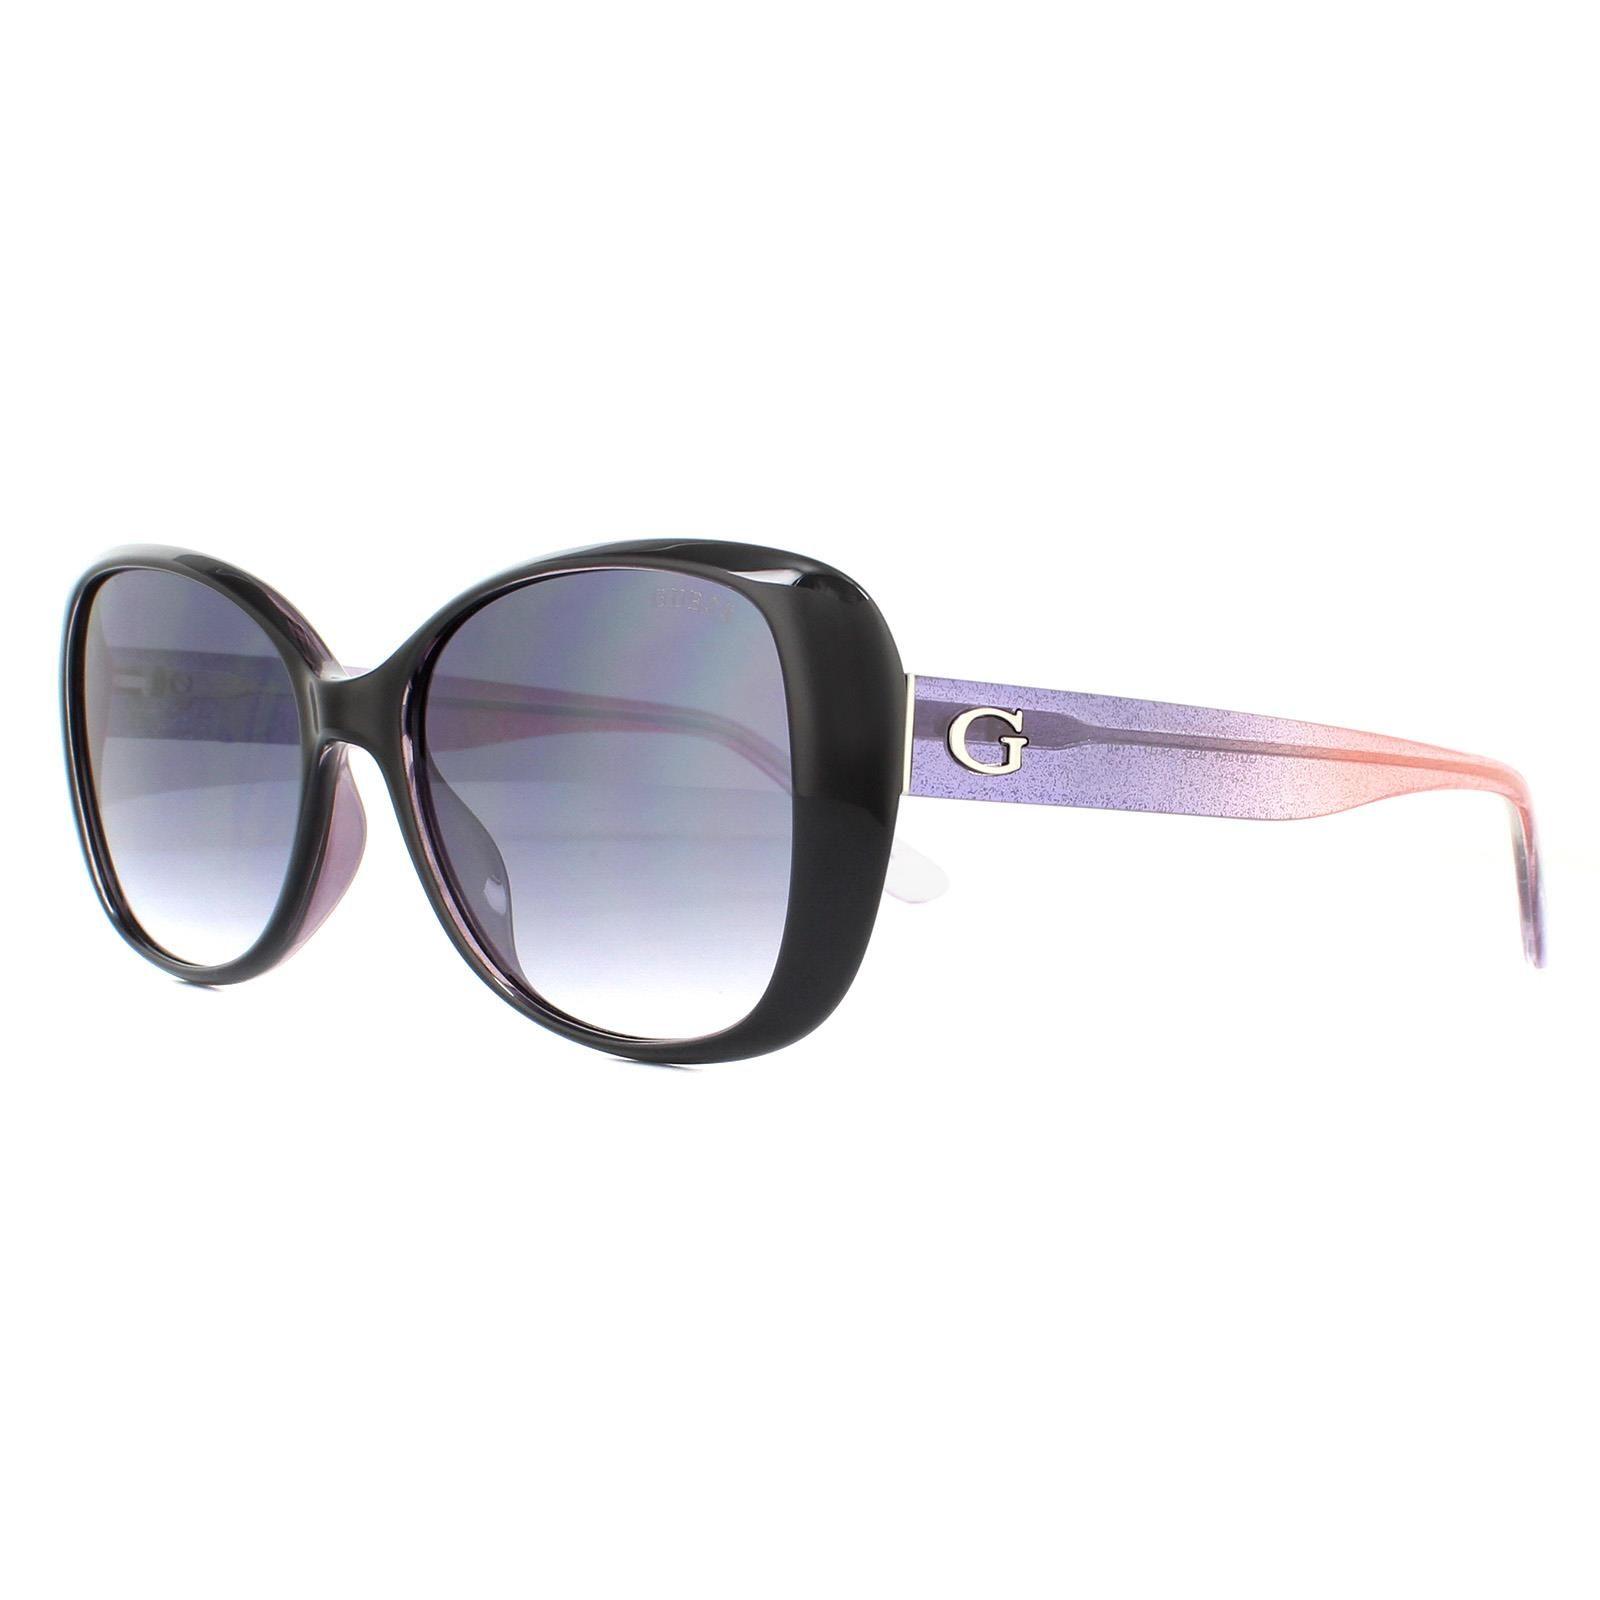 Guess Sunglasses GU7554 05B Black Pink Gradient Grey Gradient